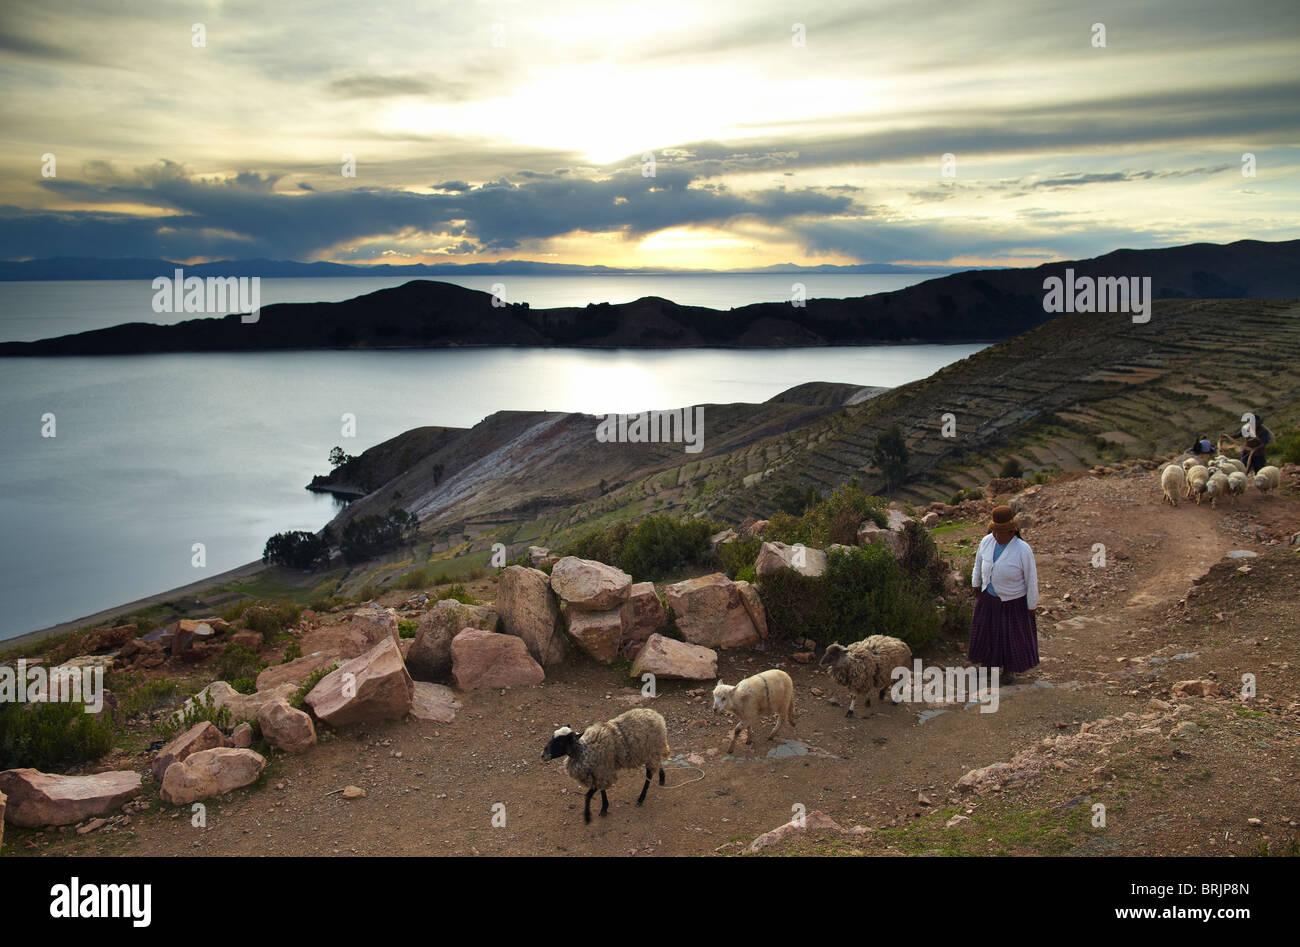 a woman with sheep, Isla del Sol, Lake Titicaca, Bolivia - Stock Image